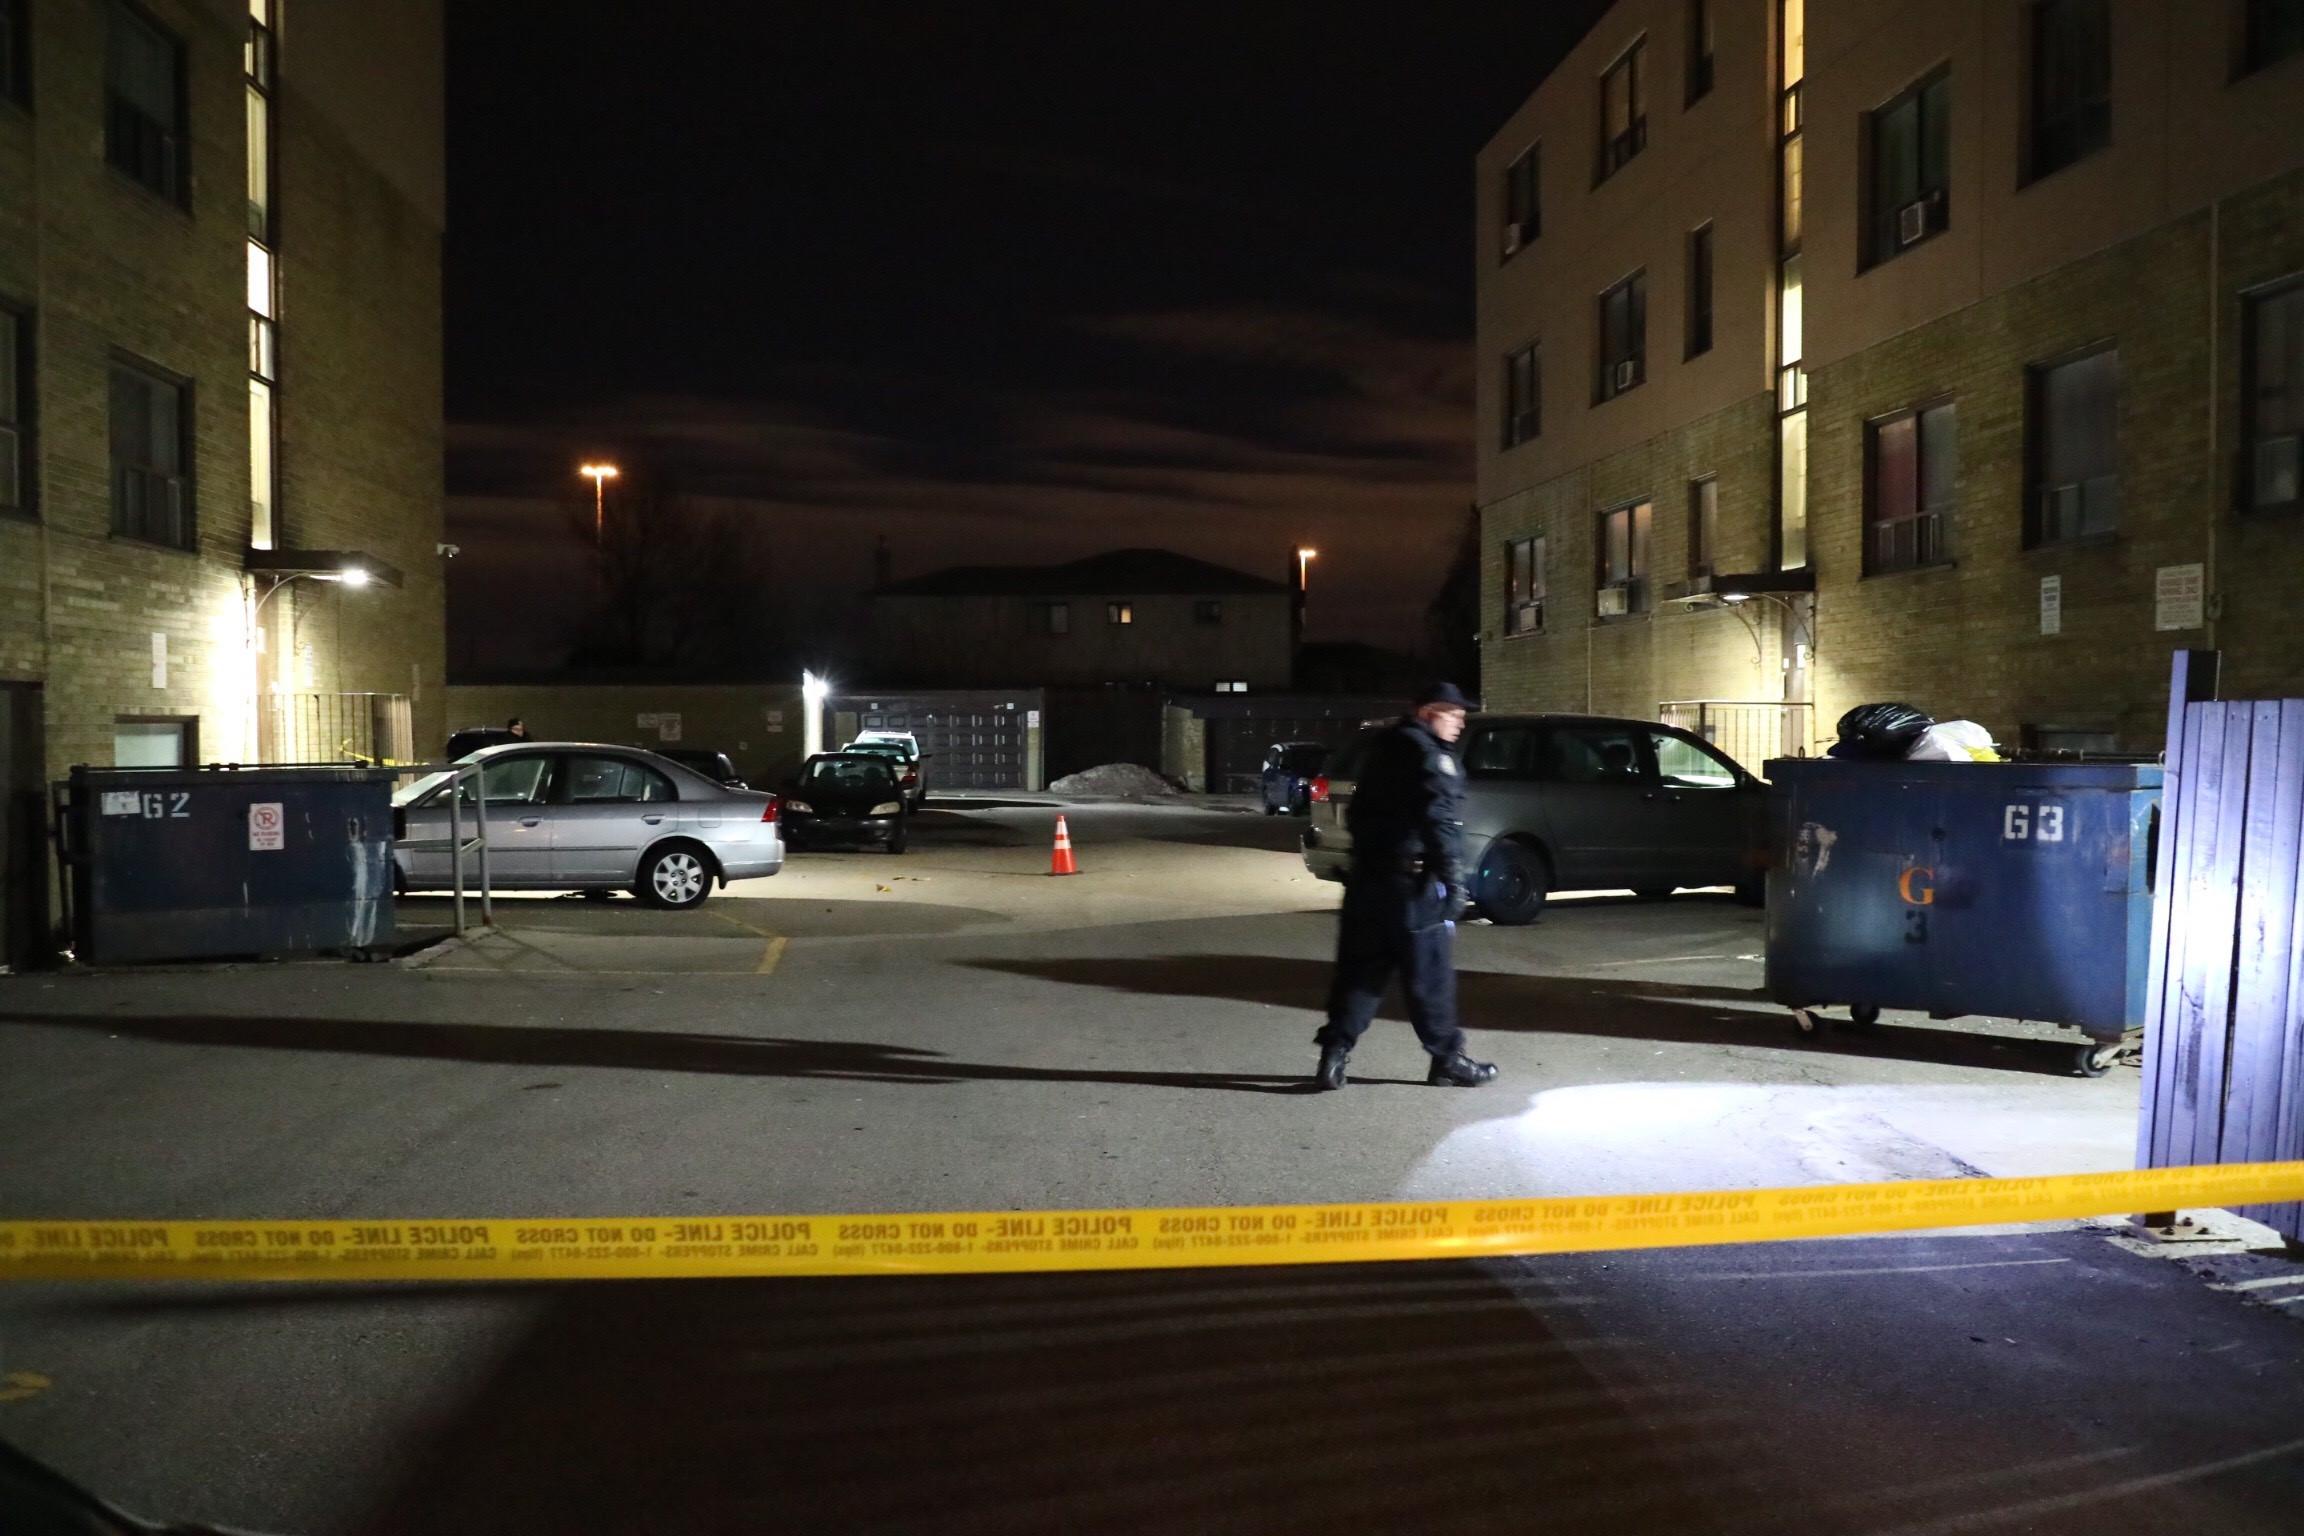 Police investigate after shots were fired in North York on Feb. 22, 2018. CITYNEWS/Josef Fazio